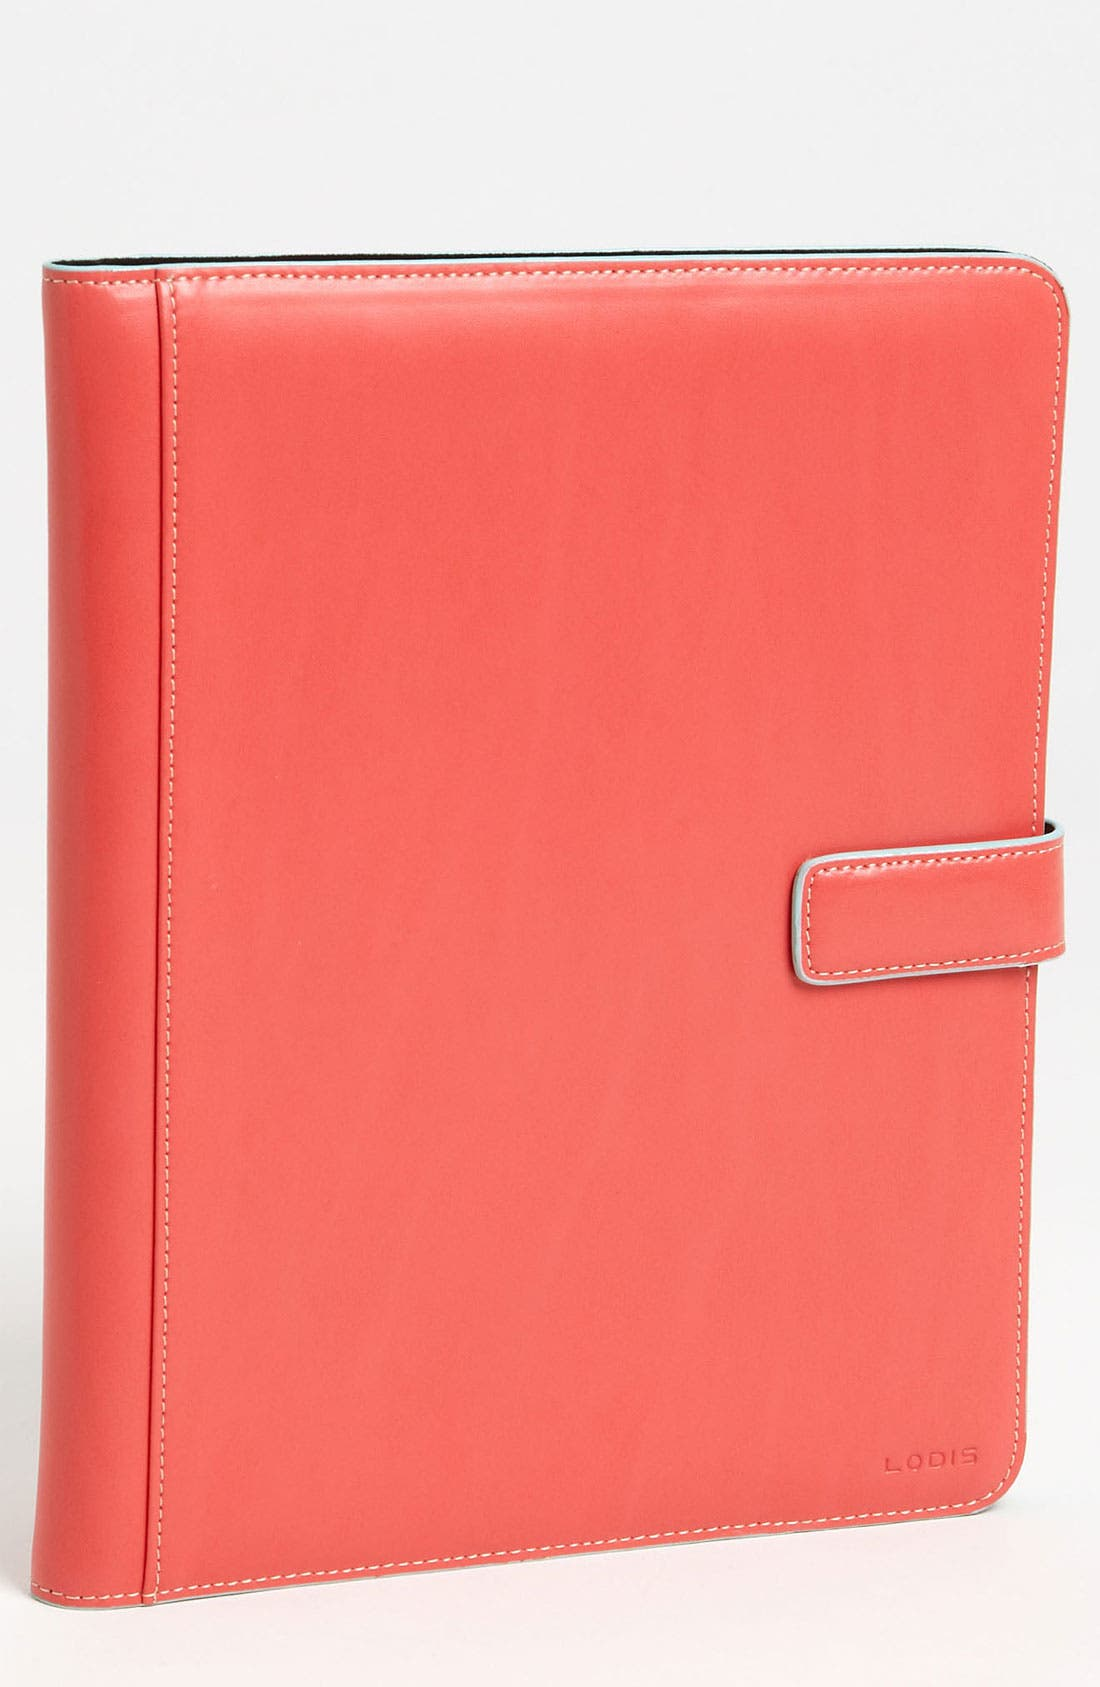 Alternate Image 1 Selected - Lodis 'Sylvie Swivel' iPad Case